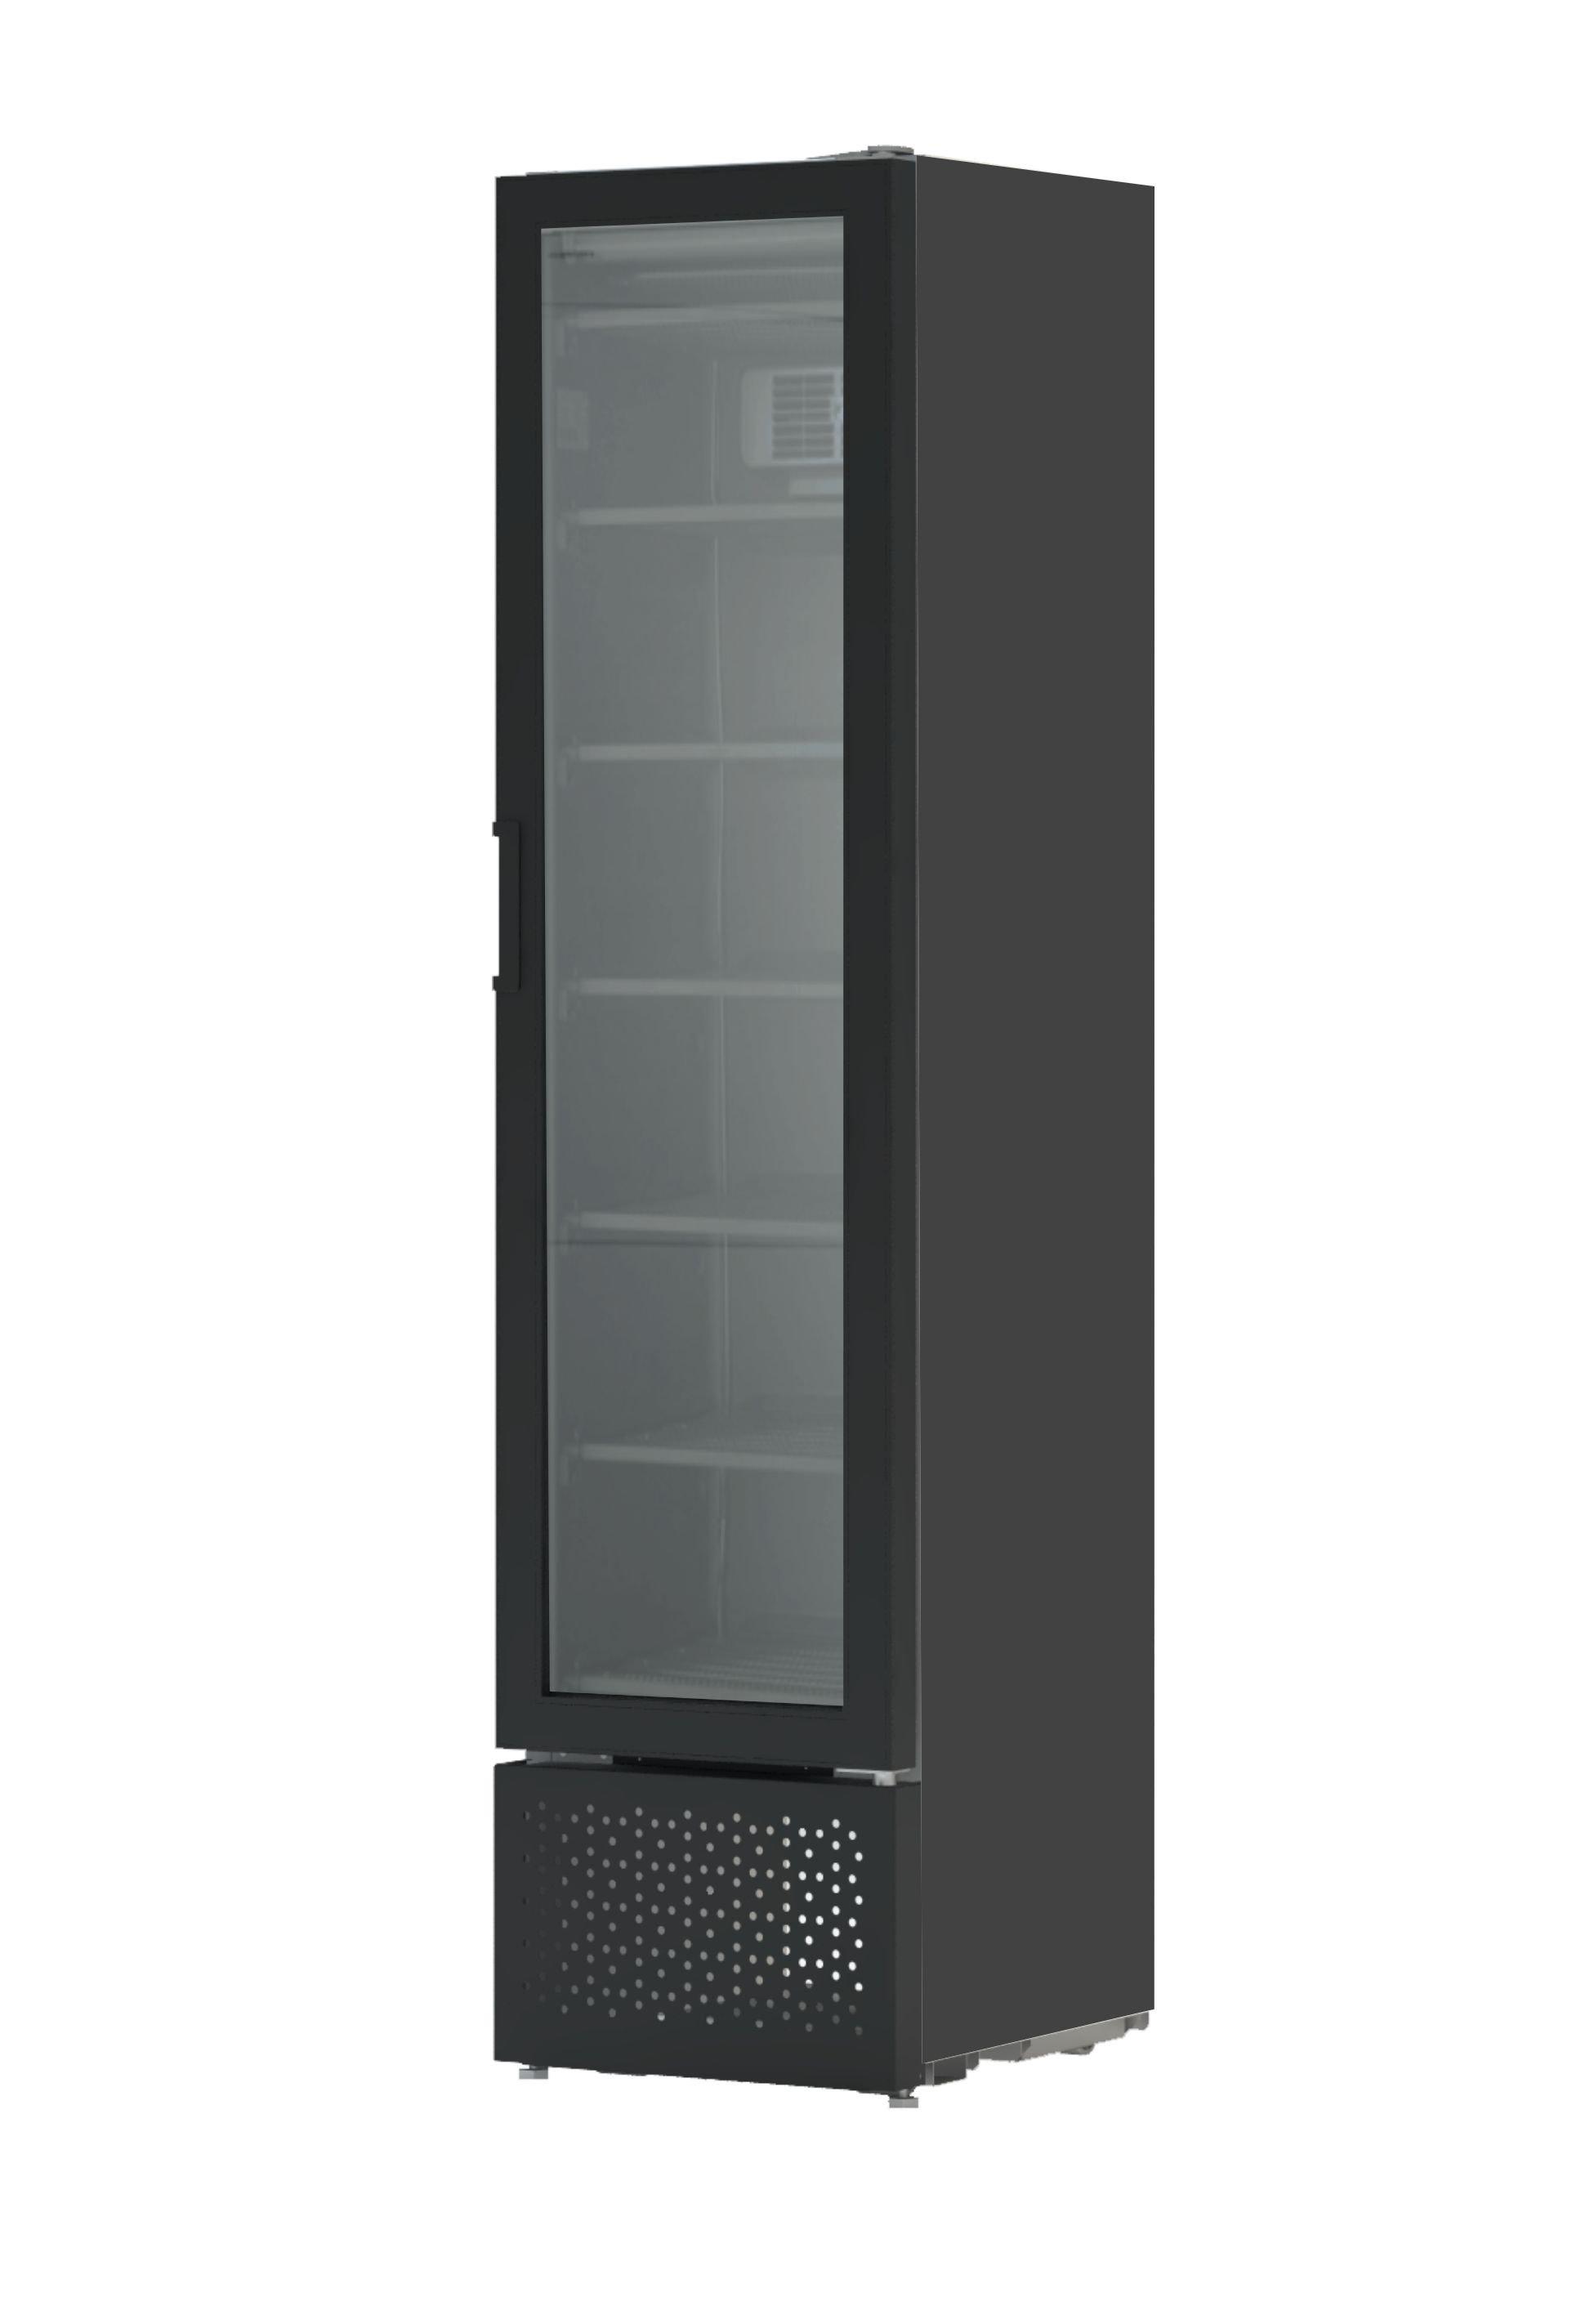 senox-ssc-105